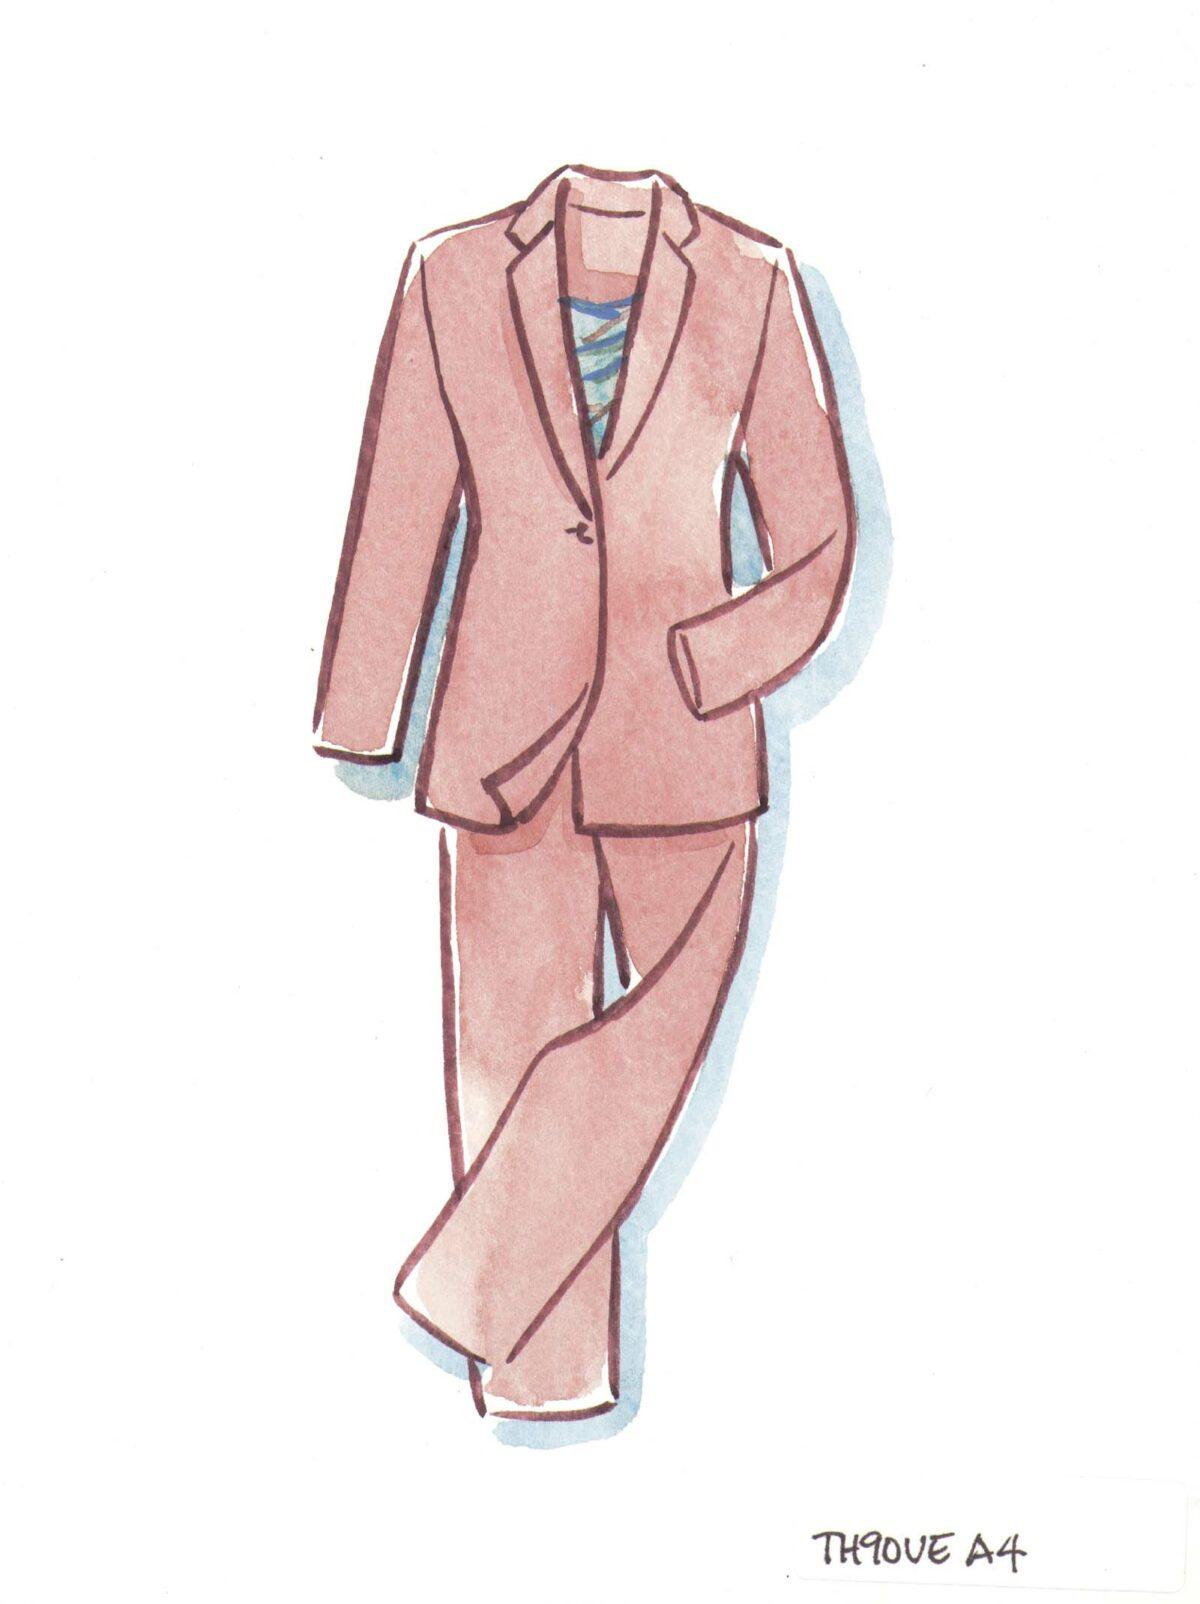 Dull pink gabardine jacket and pants